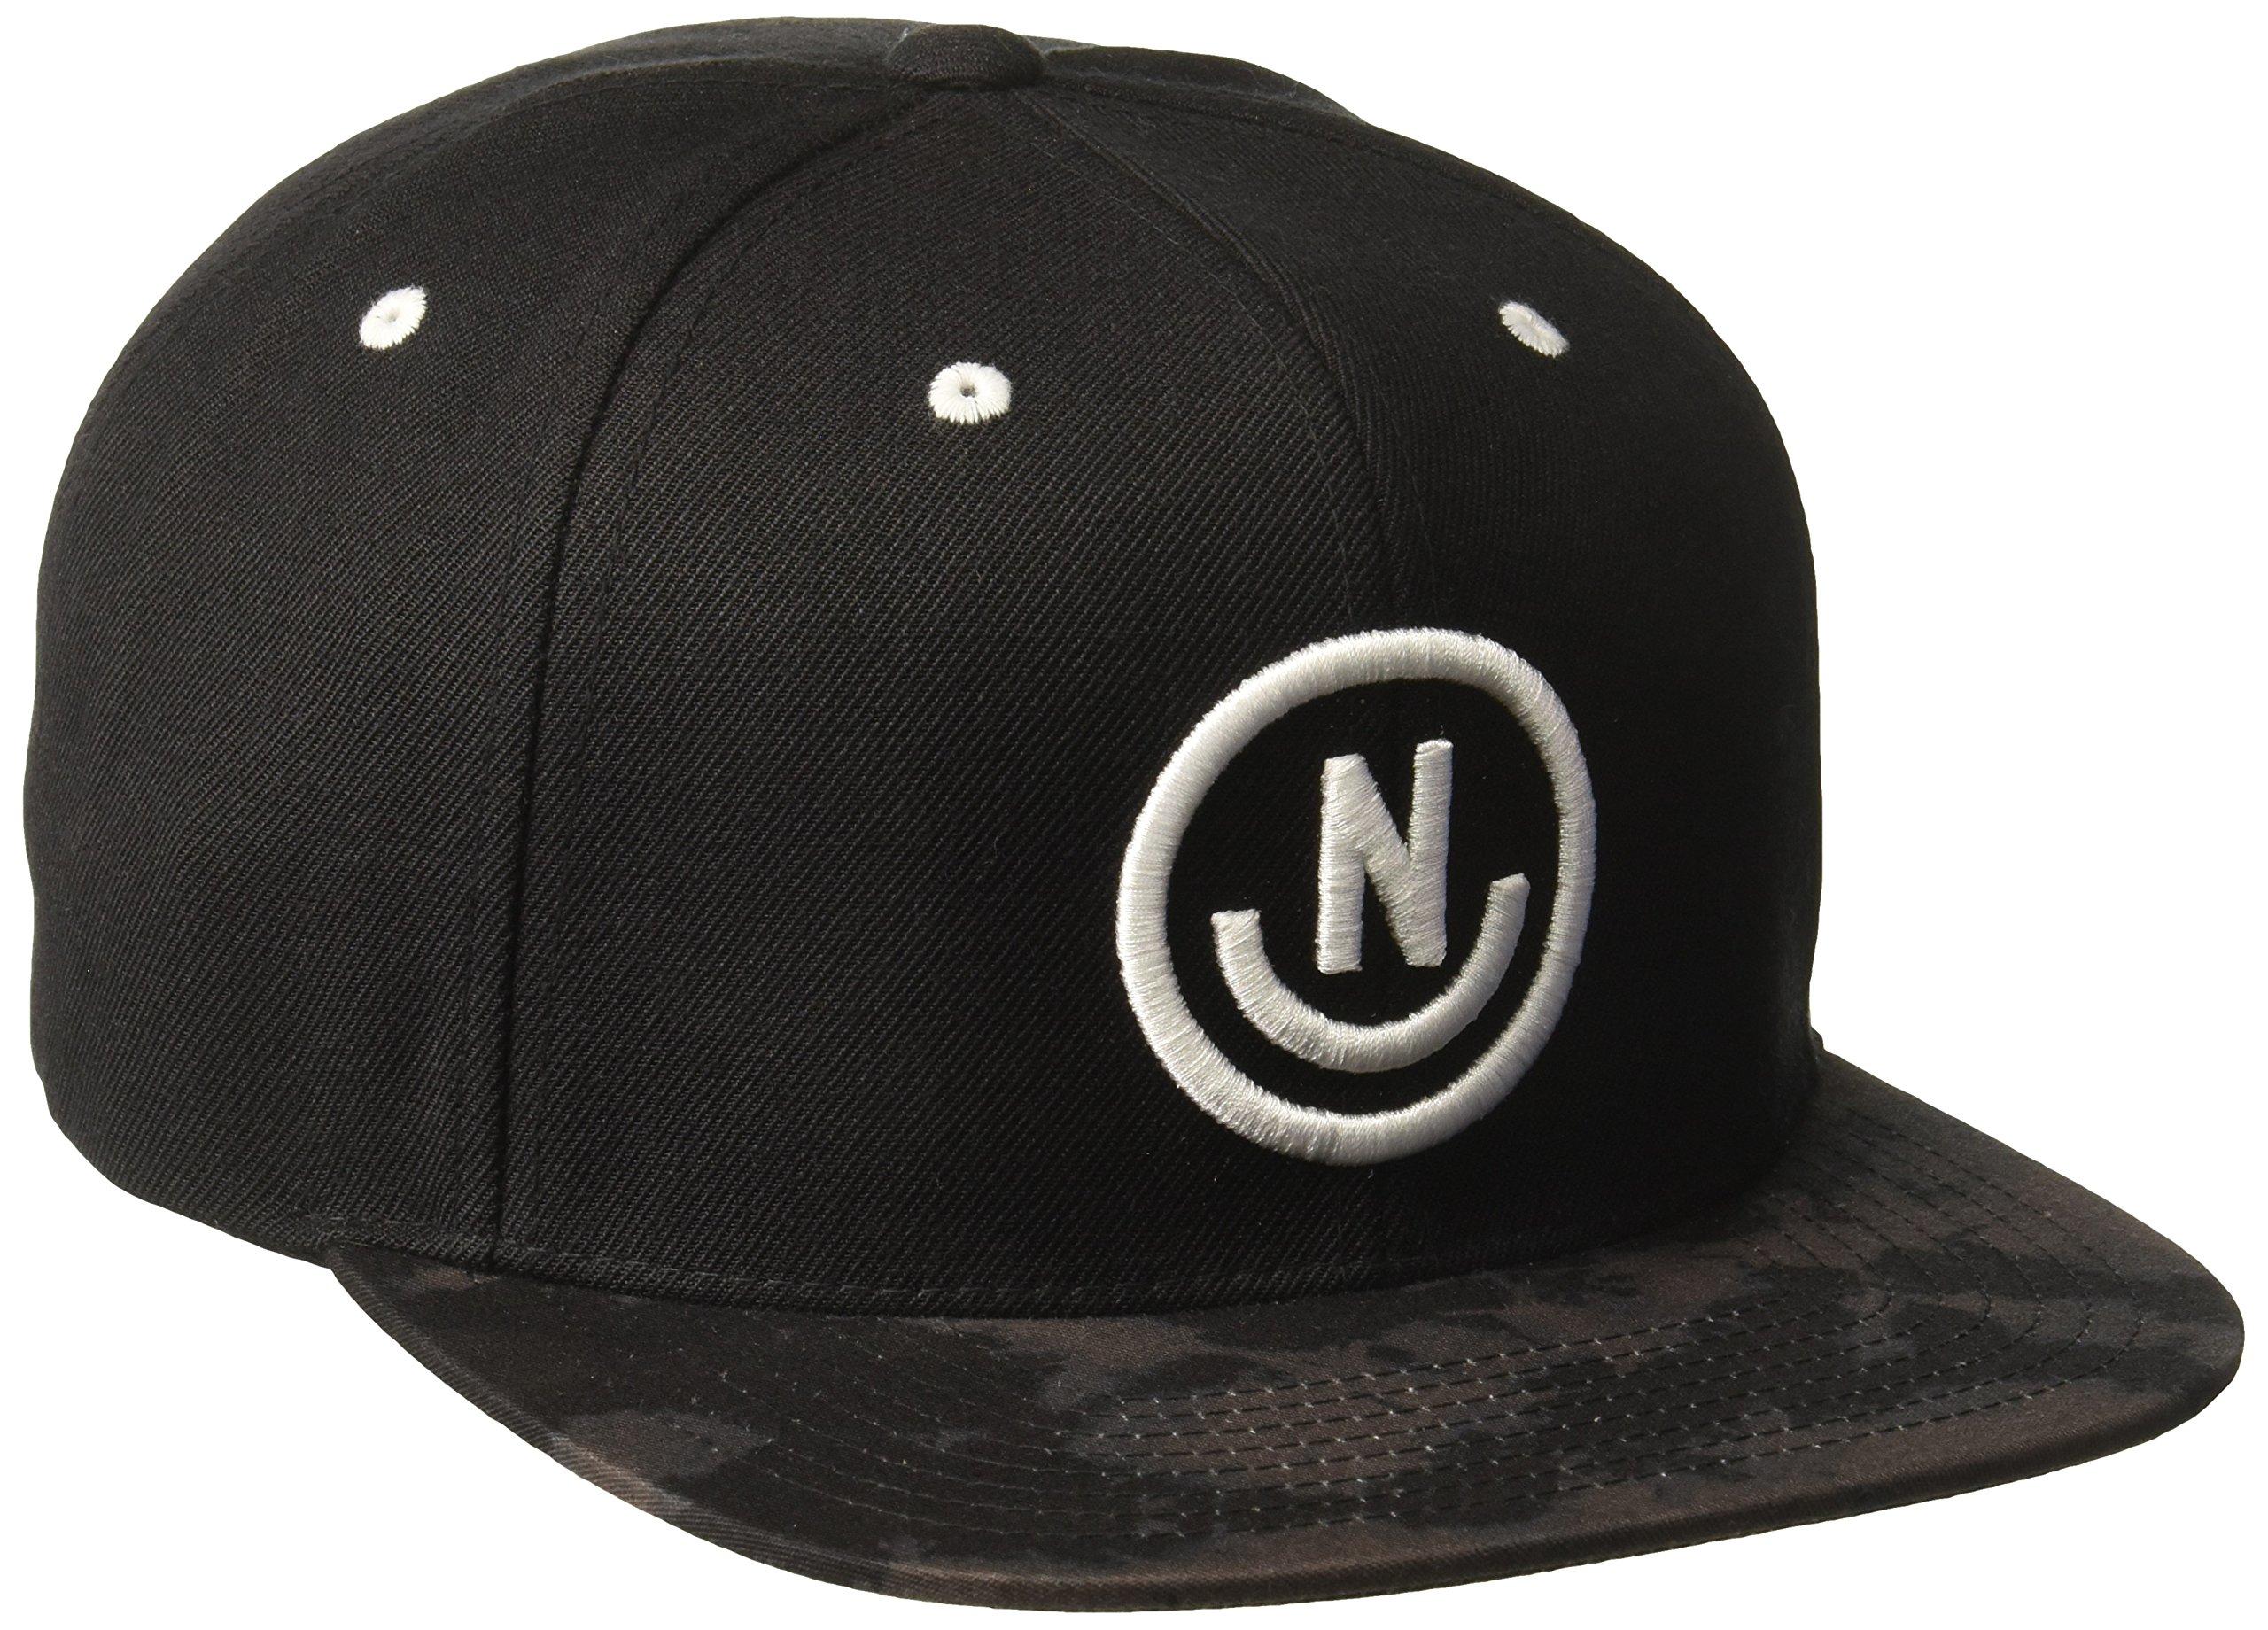 NEFF Men's Daily Cap, Black Wash, One Size